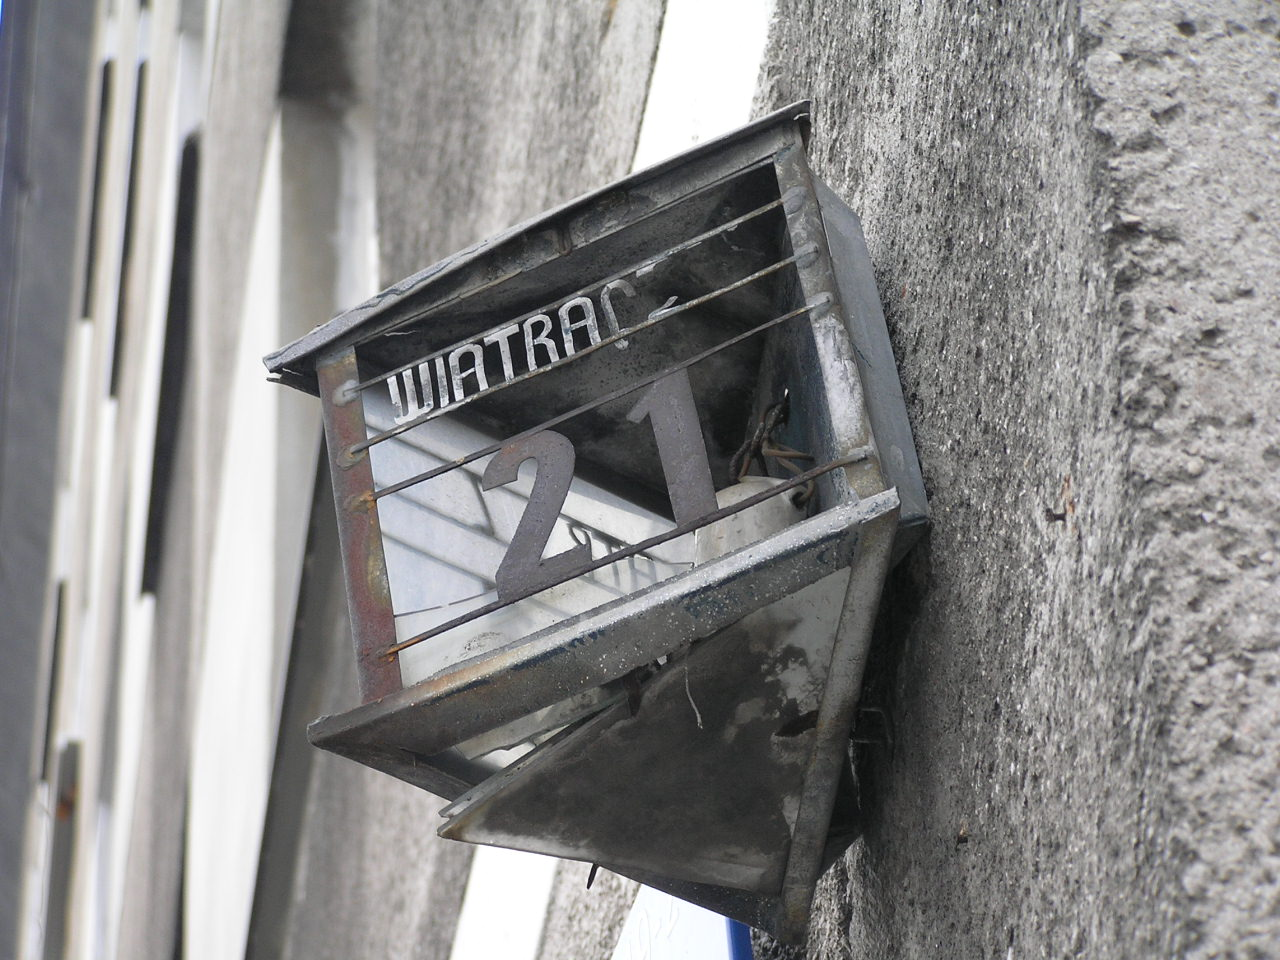 Latarenka adresowa - Wiatraczna 21